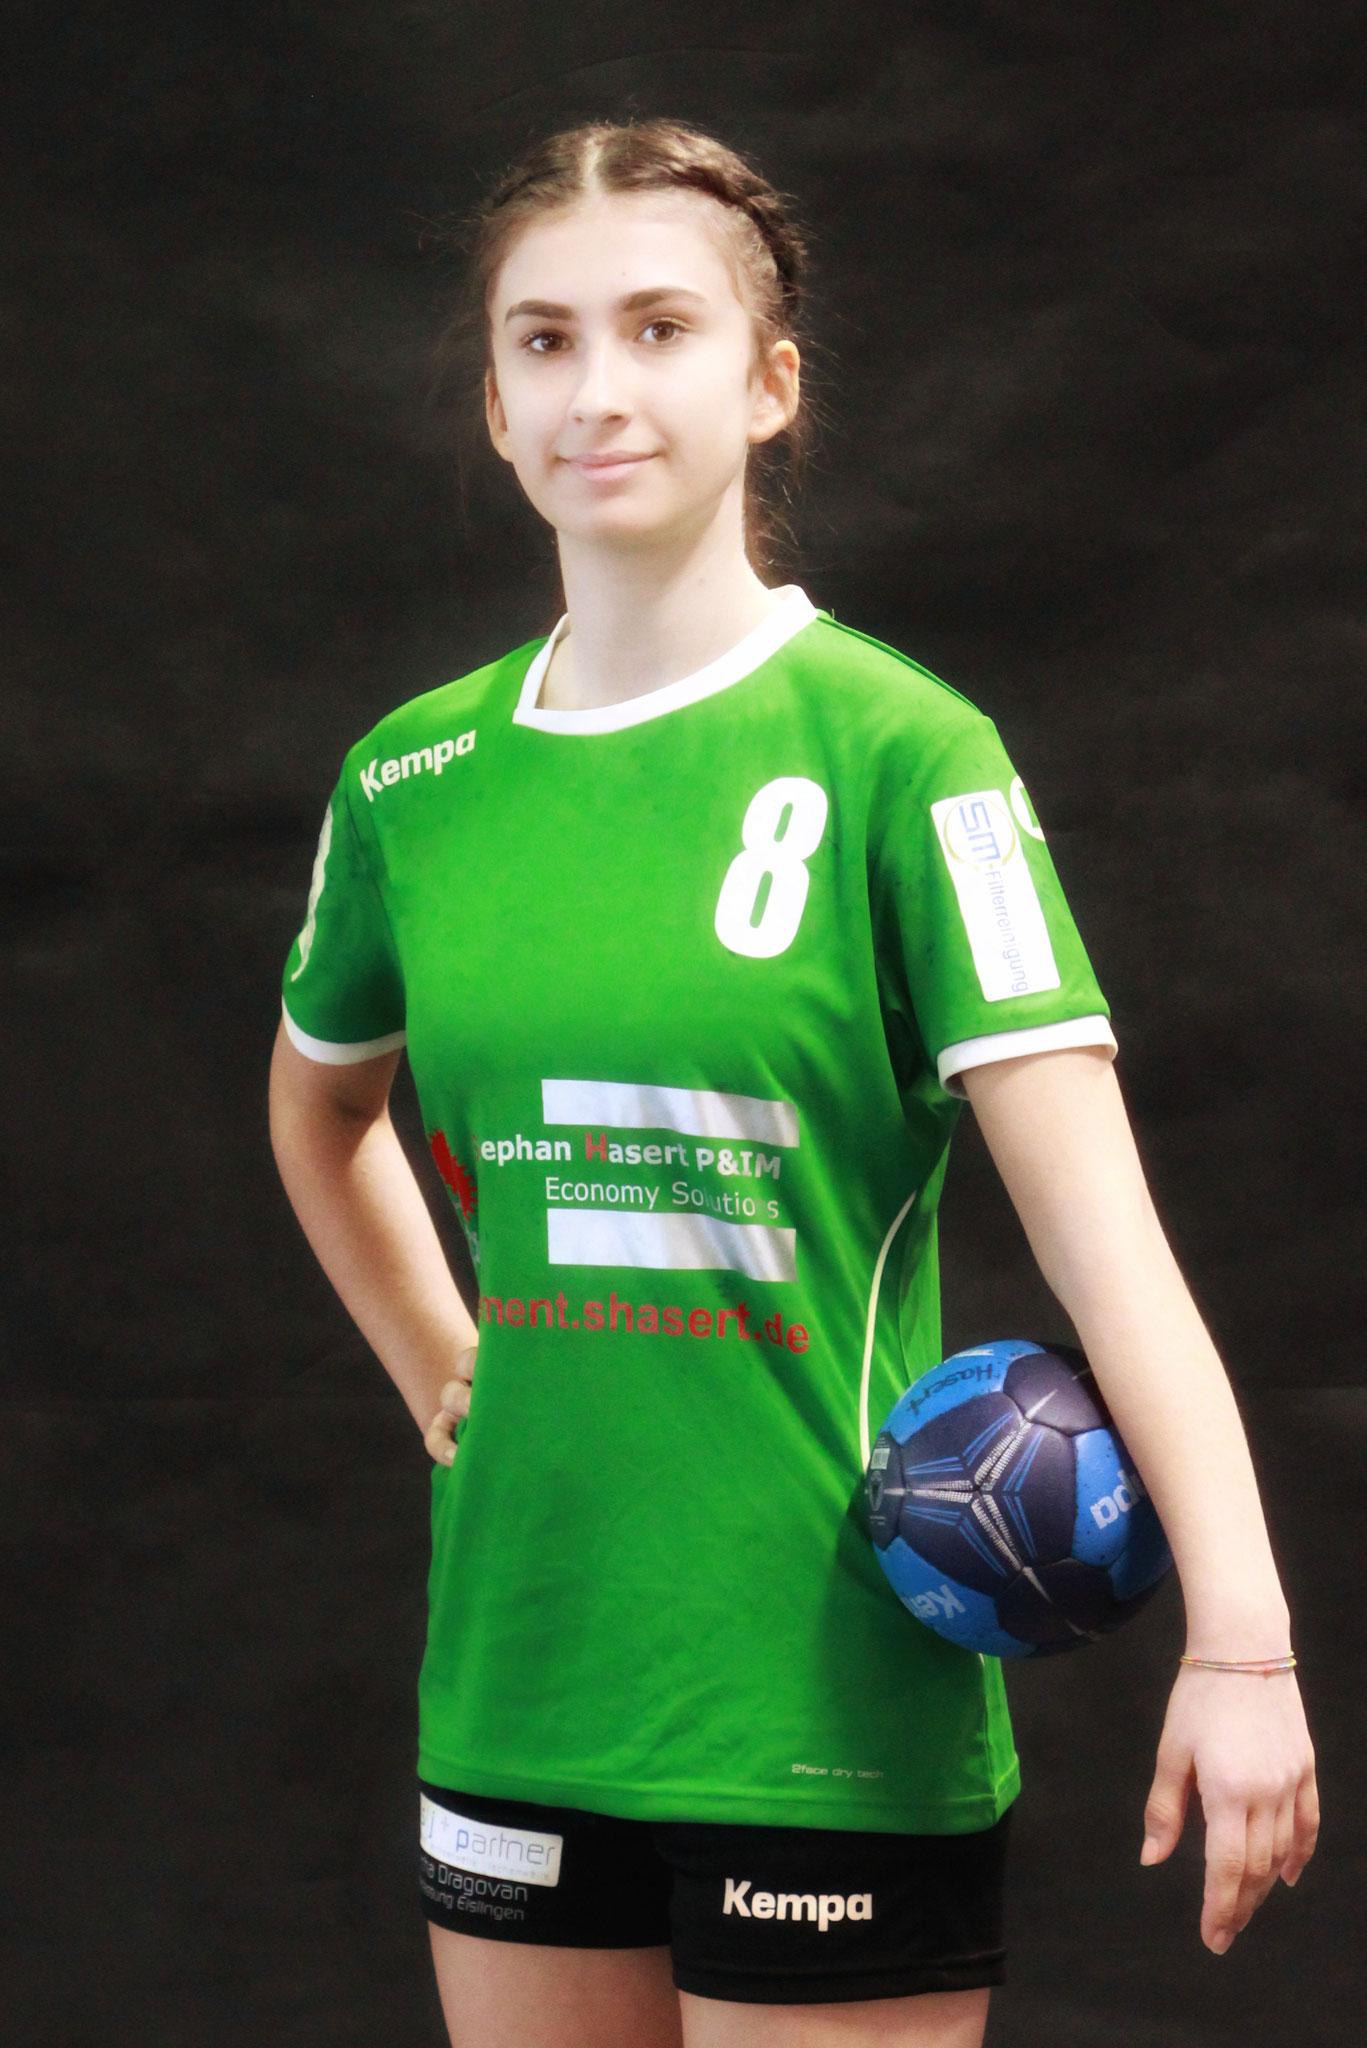 #8 Daniela Nan